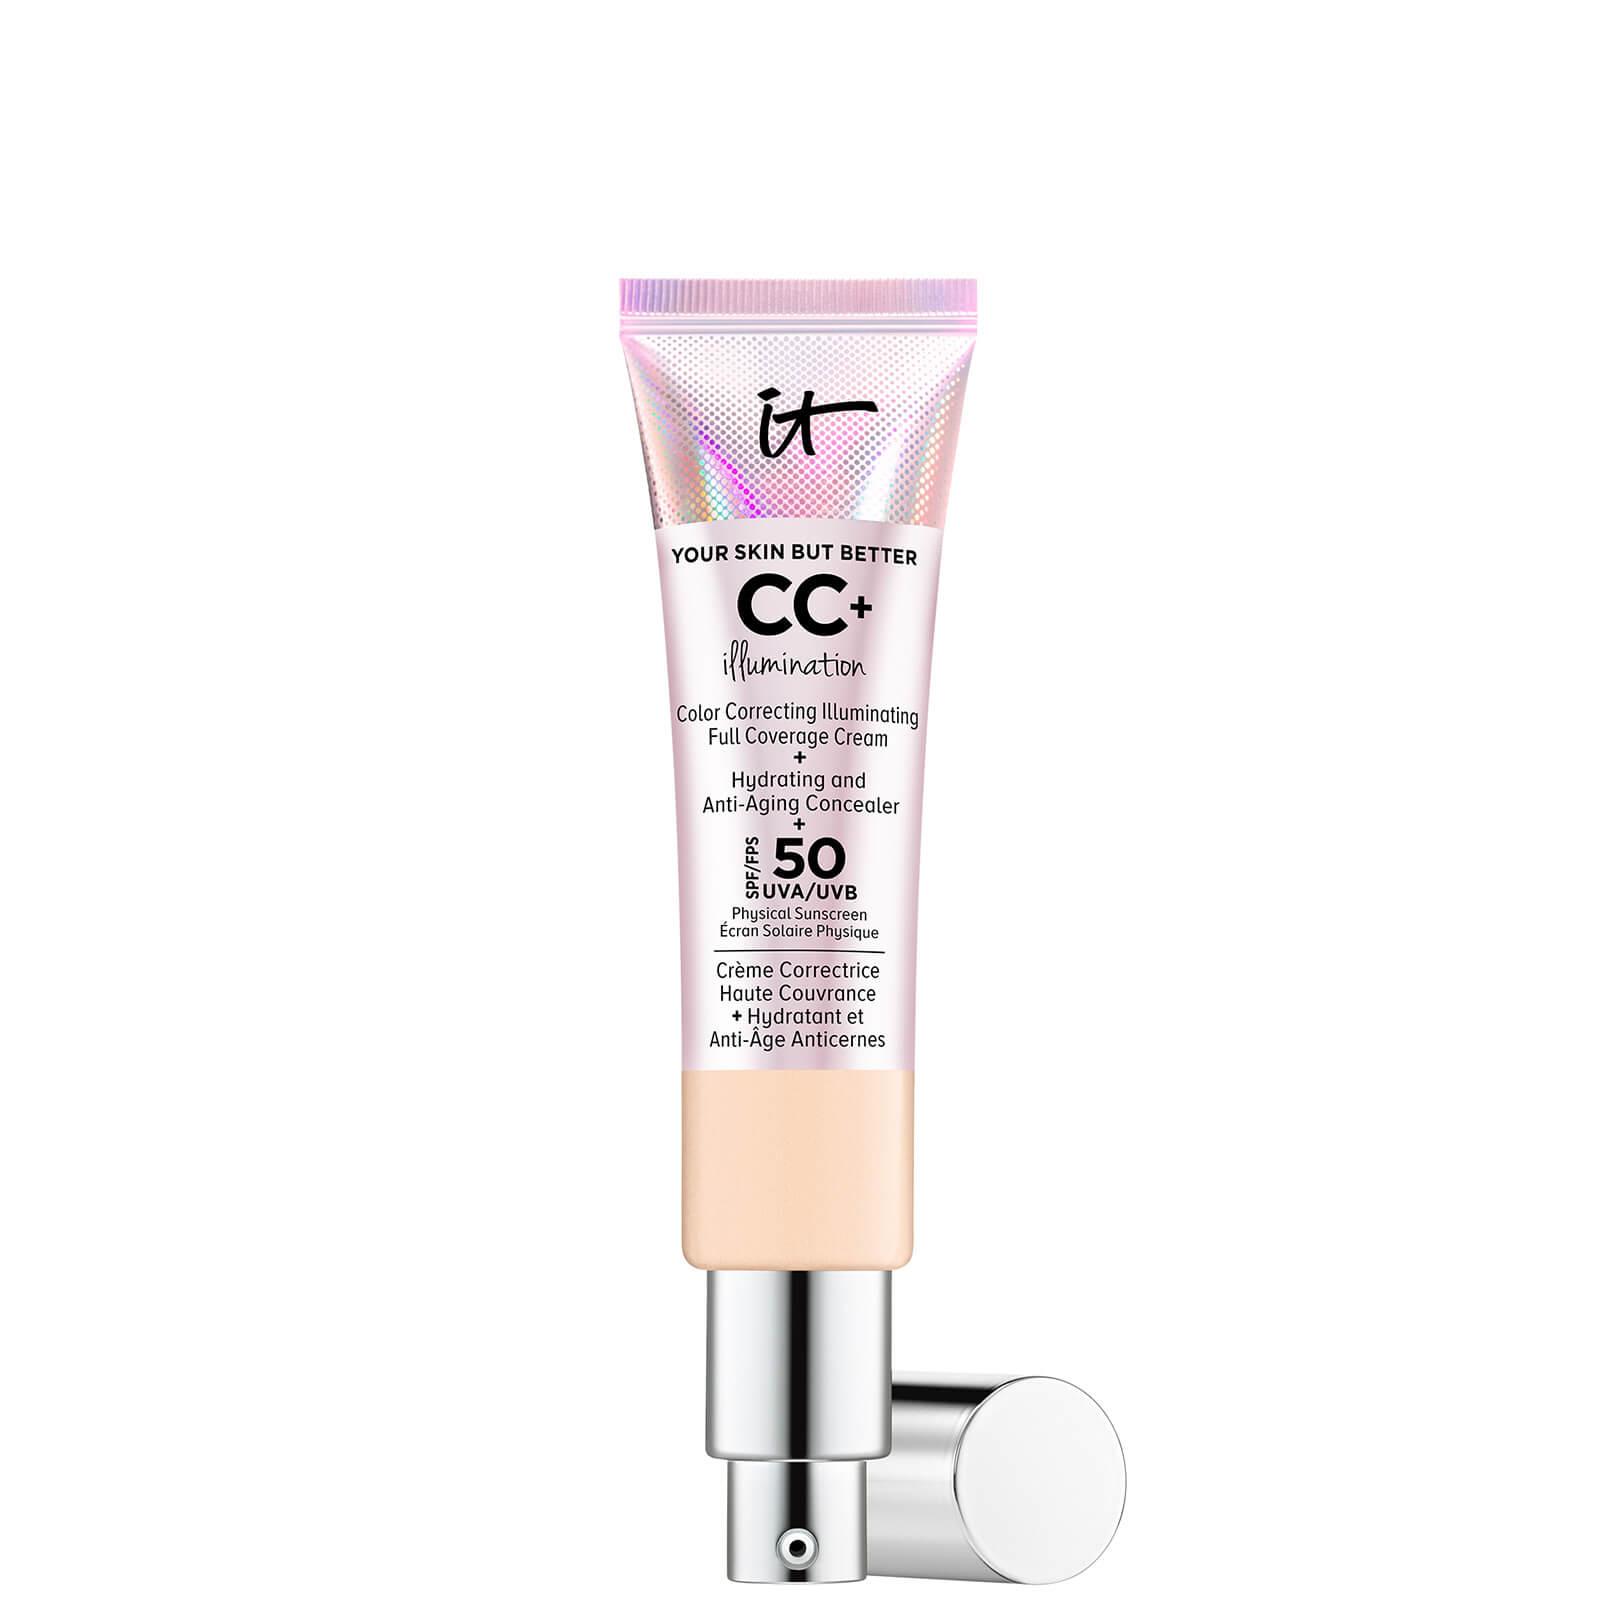 Купить IT Cosmetics Your Skin But Better CC+ Illumination SPF50 32ml (Various Shades) - Light Medium